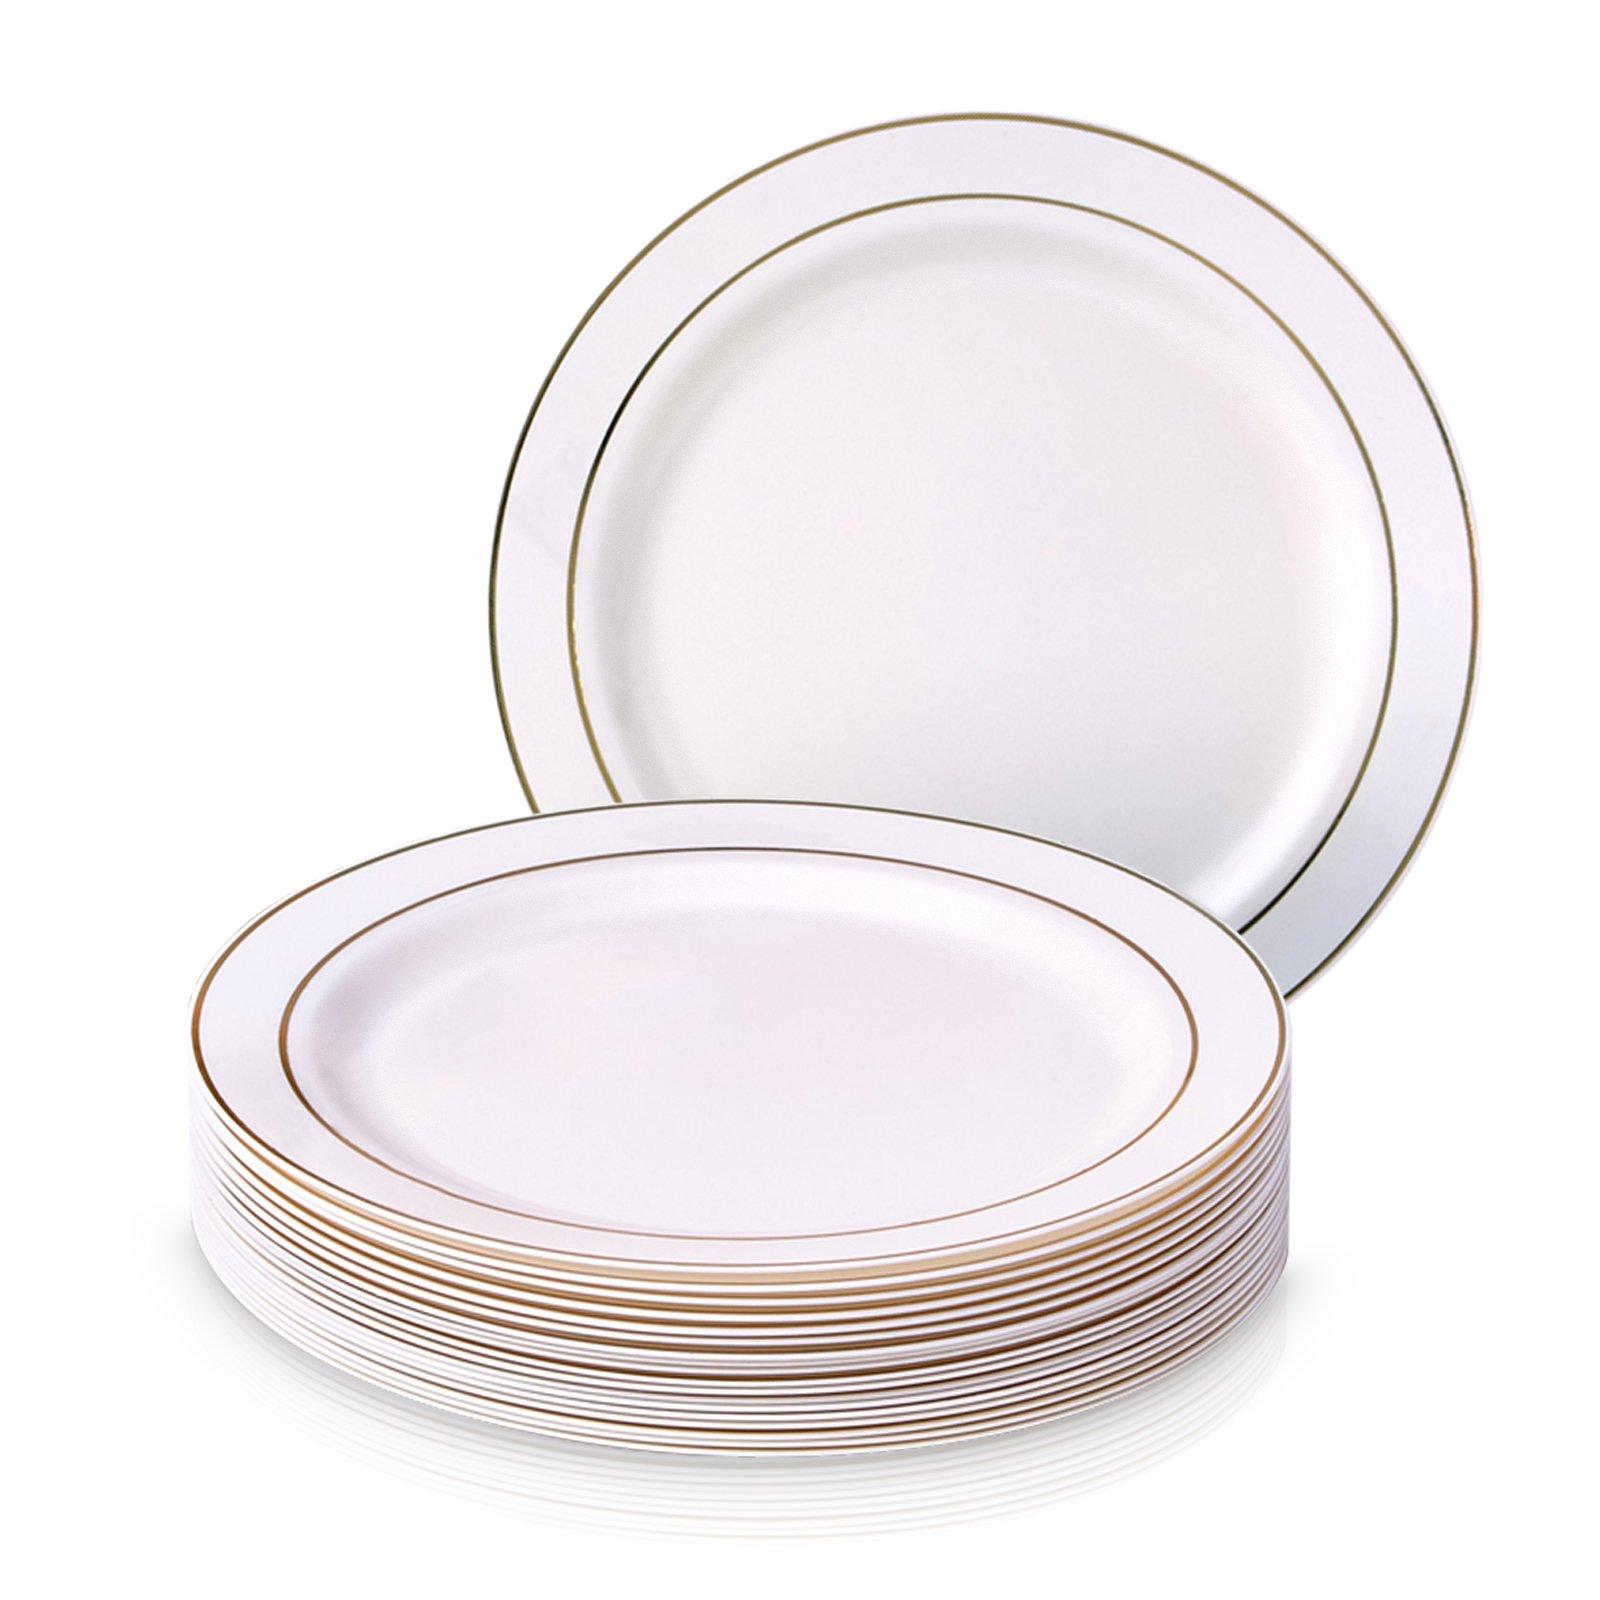 DISPOSABLE DINNERWARE SET, 20 Side Plates (Glare - Ivory/Gold, 7.5'')